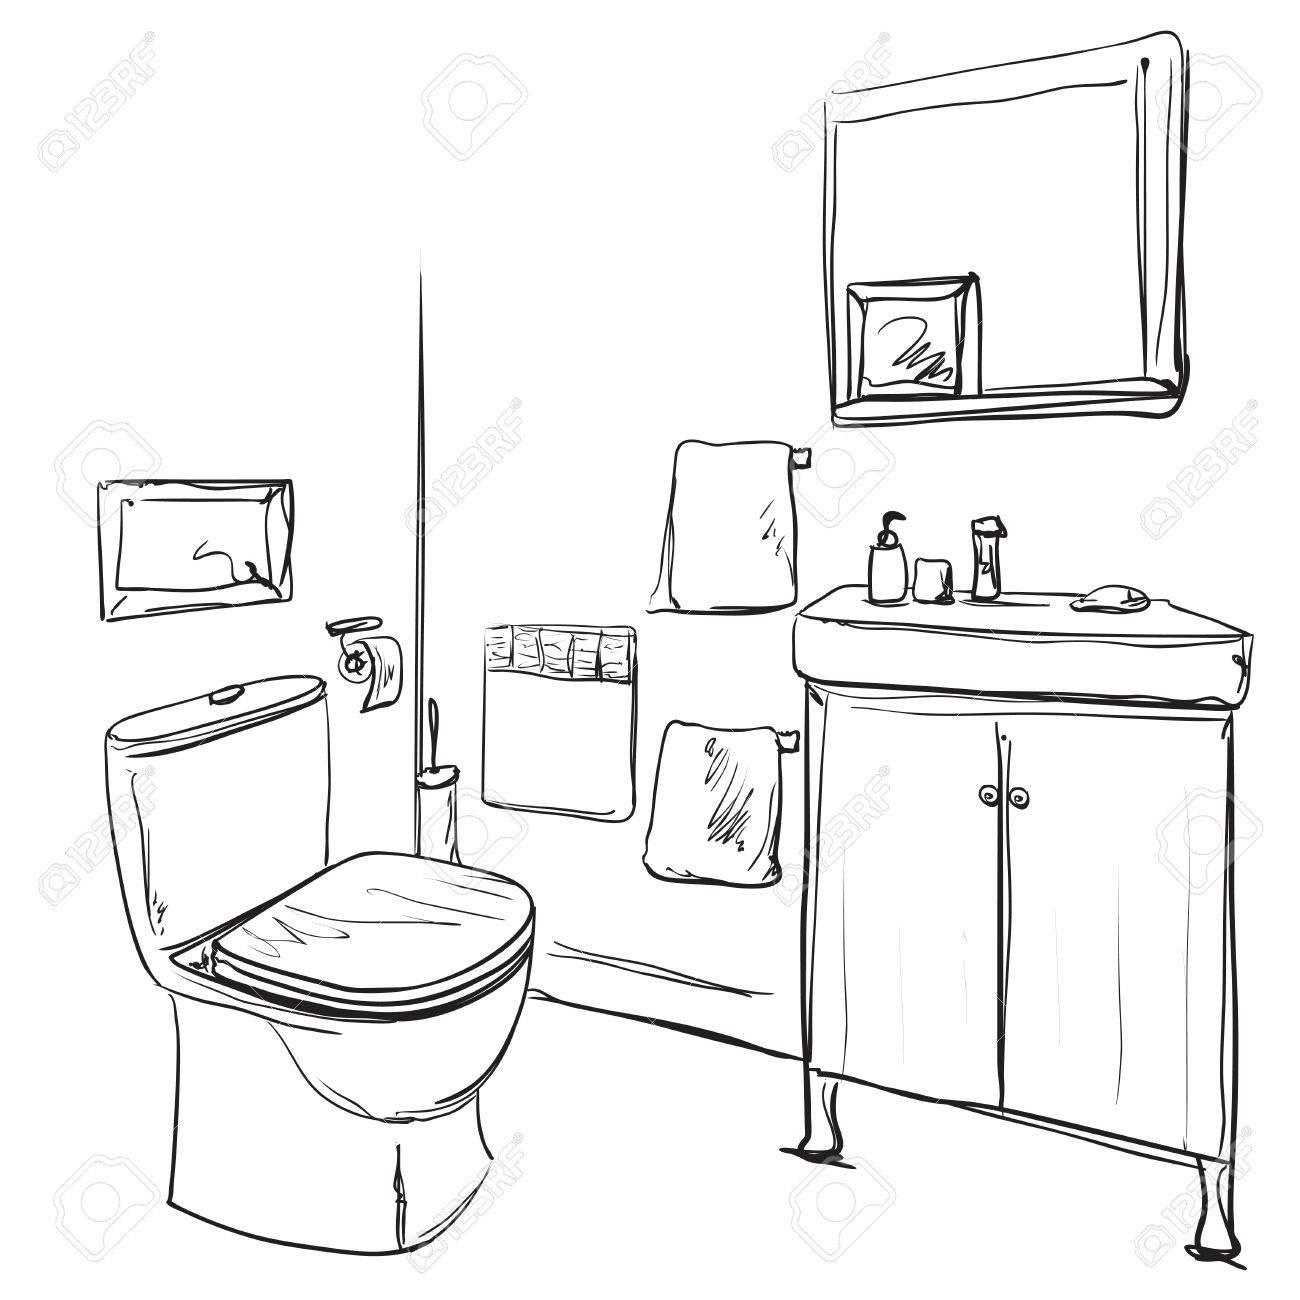 Hand drawn Bathroom. Washbasin and furniture sketch on neat presentation. - 75491815